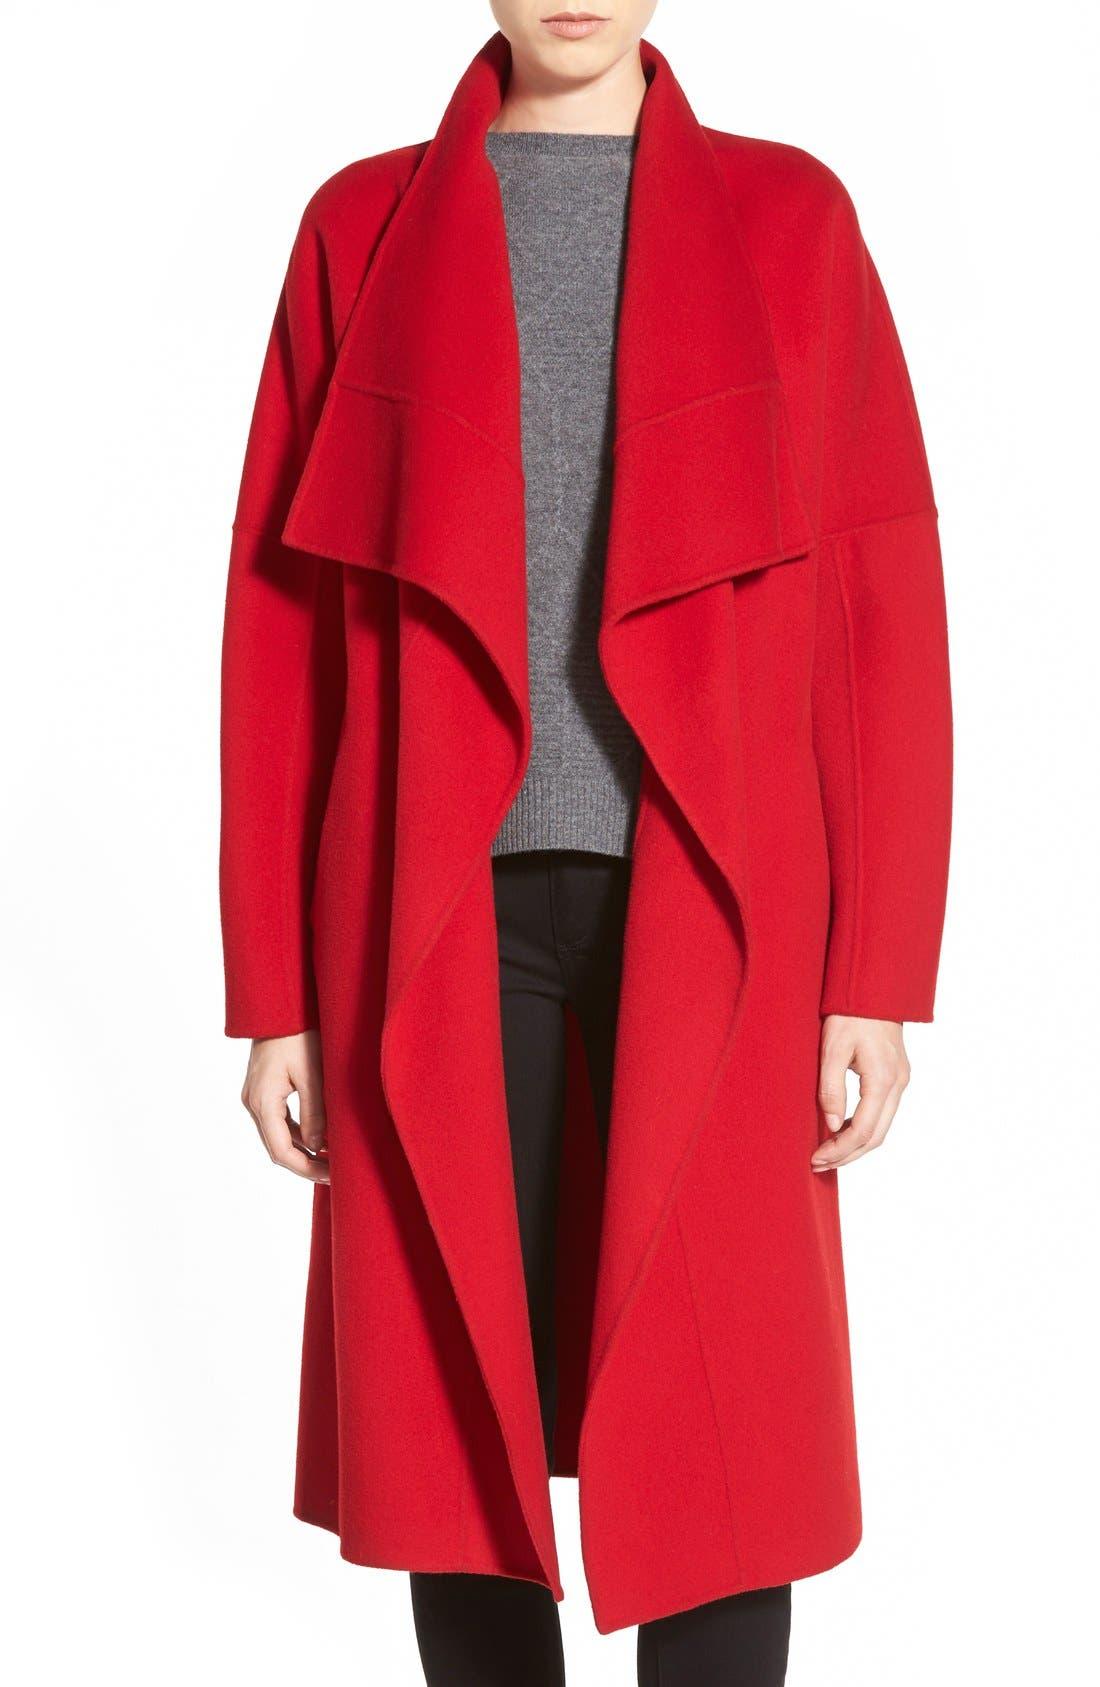 Alternate Image 1 Selected - Badgley Mischka 'Audrey' LongDouble FaceWrap Coat